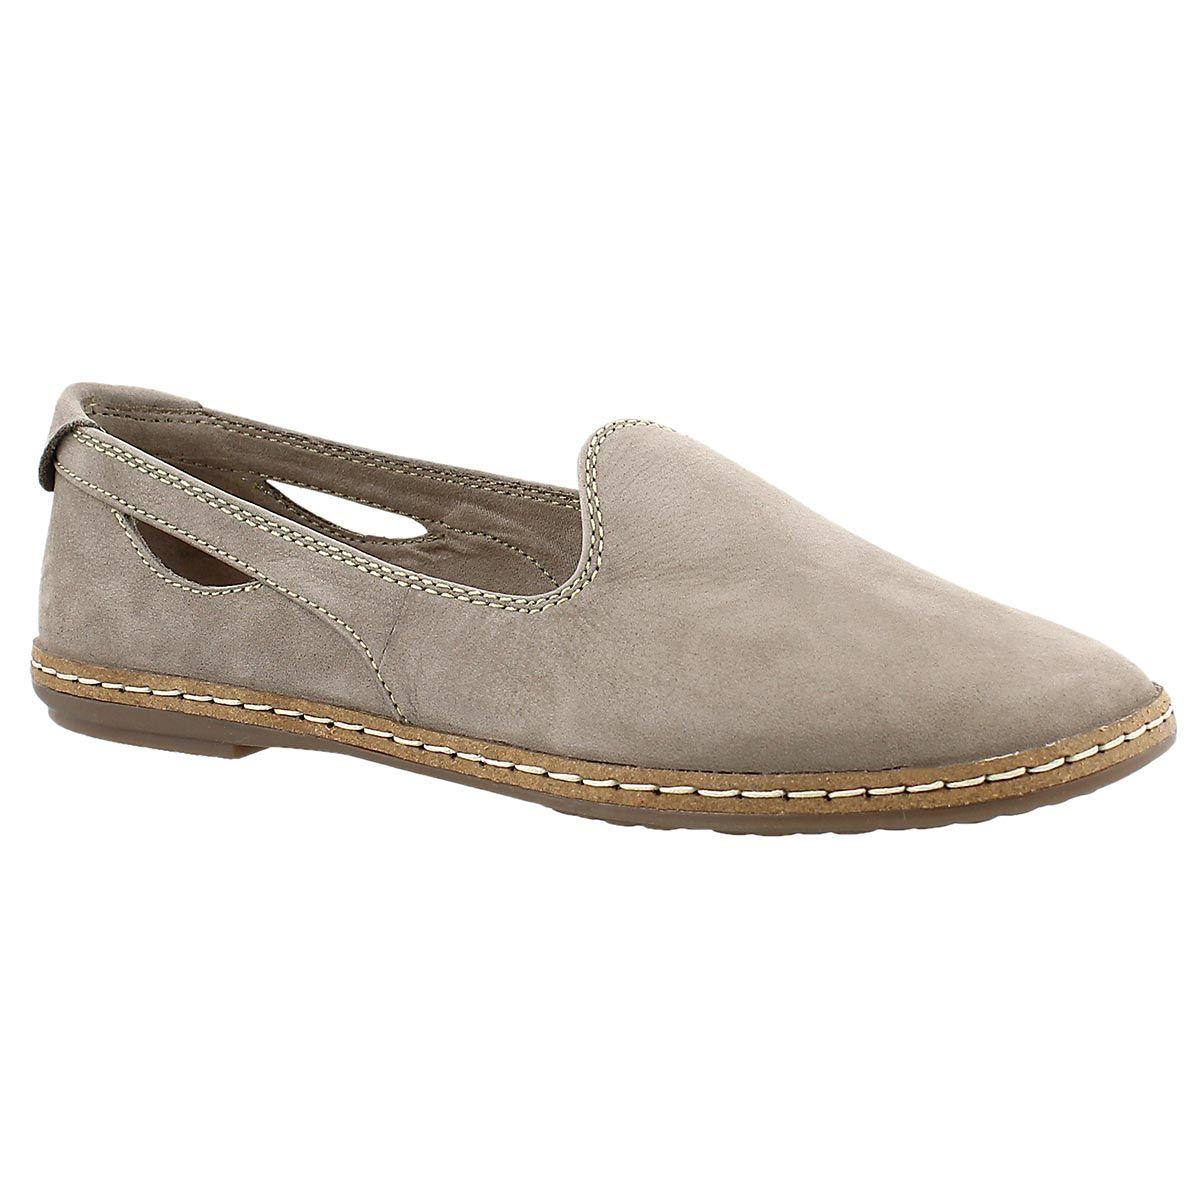 Women S Sebeka Piper Taupe Casual Flats Casual Shoes Women Casual Shoes Shoes